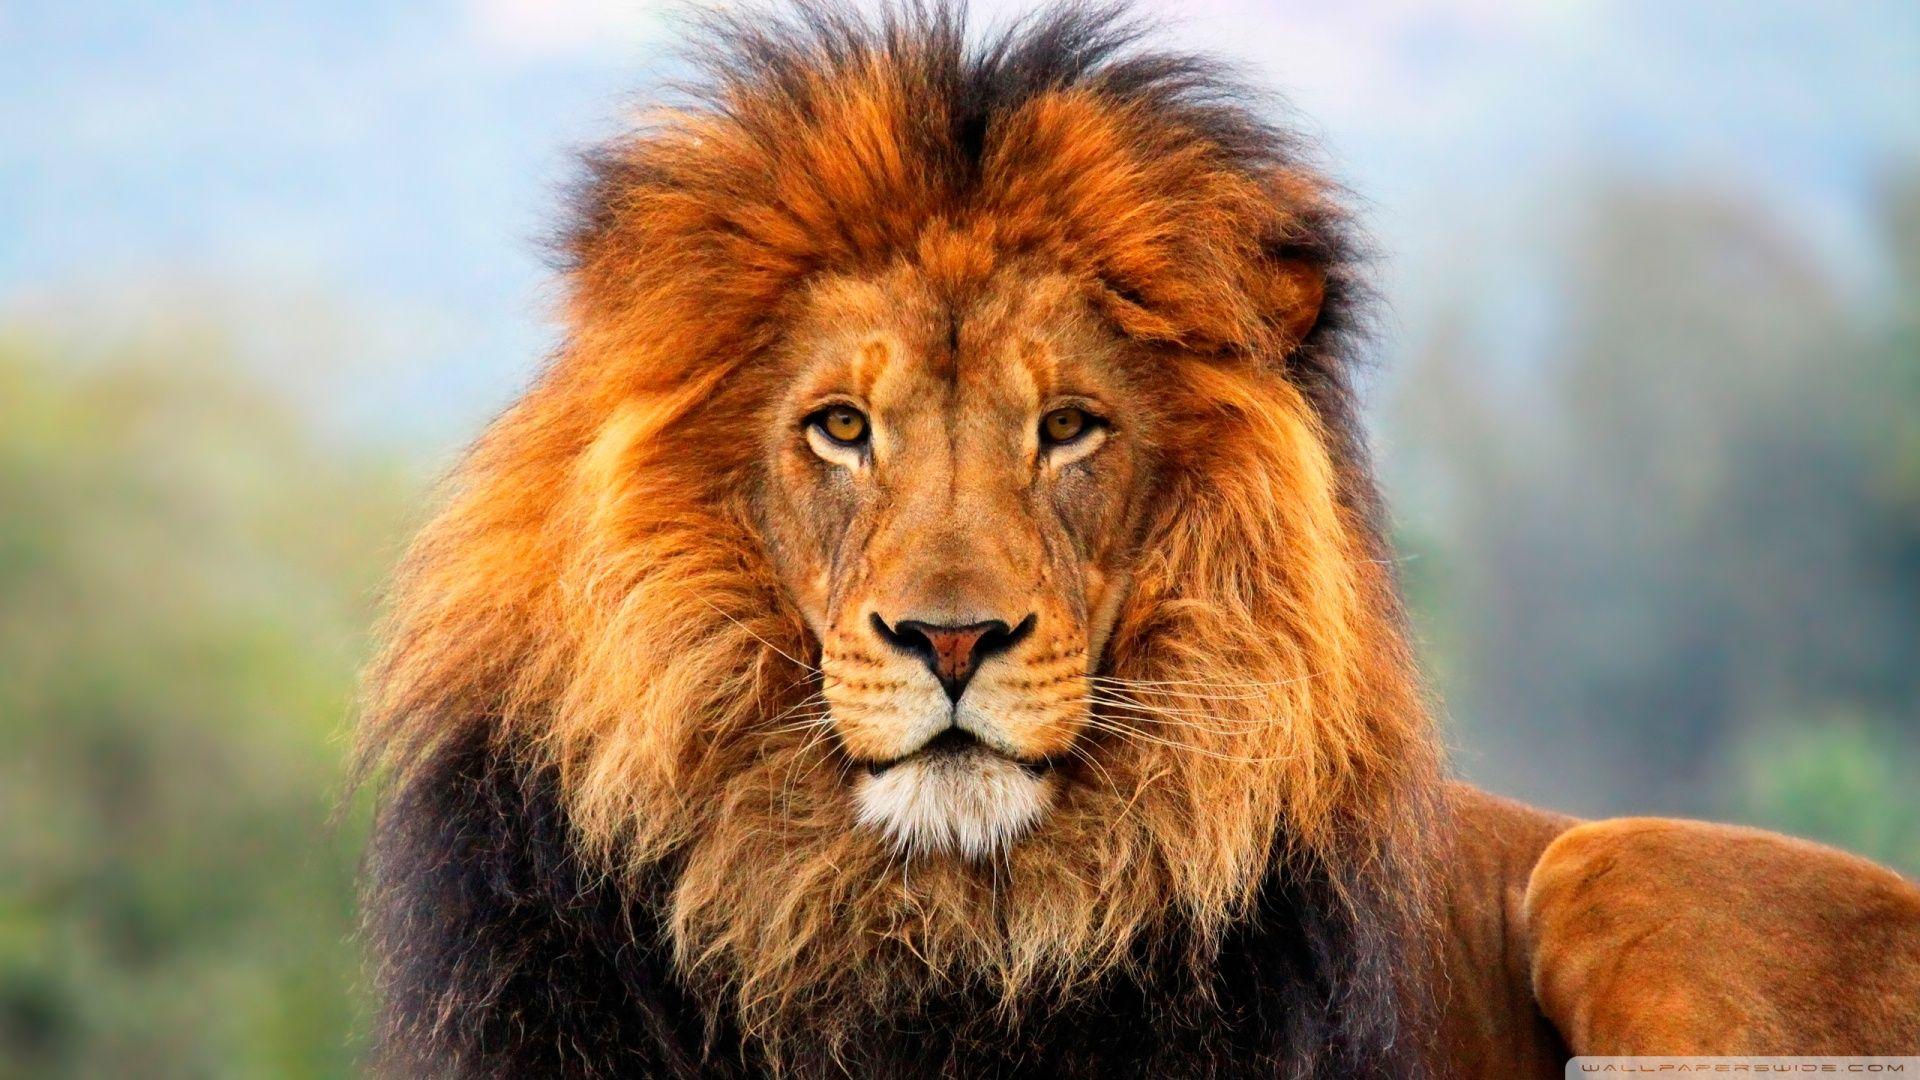 Lion ❤ 4k Hd Desktop Wallpaper For • Wide & Ultra Widescreen - Wildlife Heritage Foundation , HD Wallpaper & Backgrounds